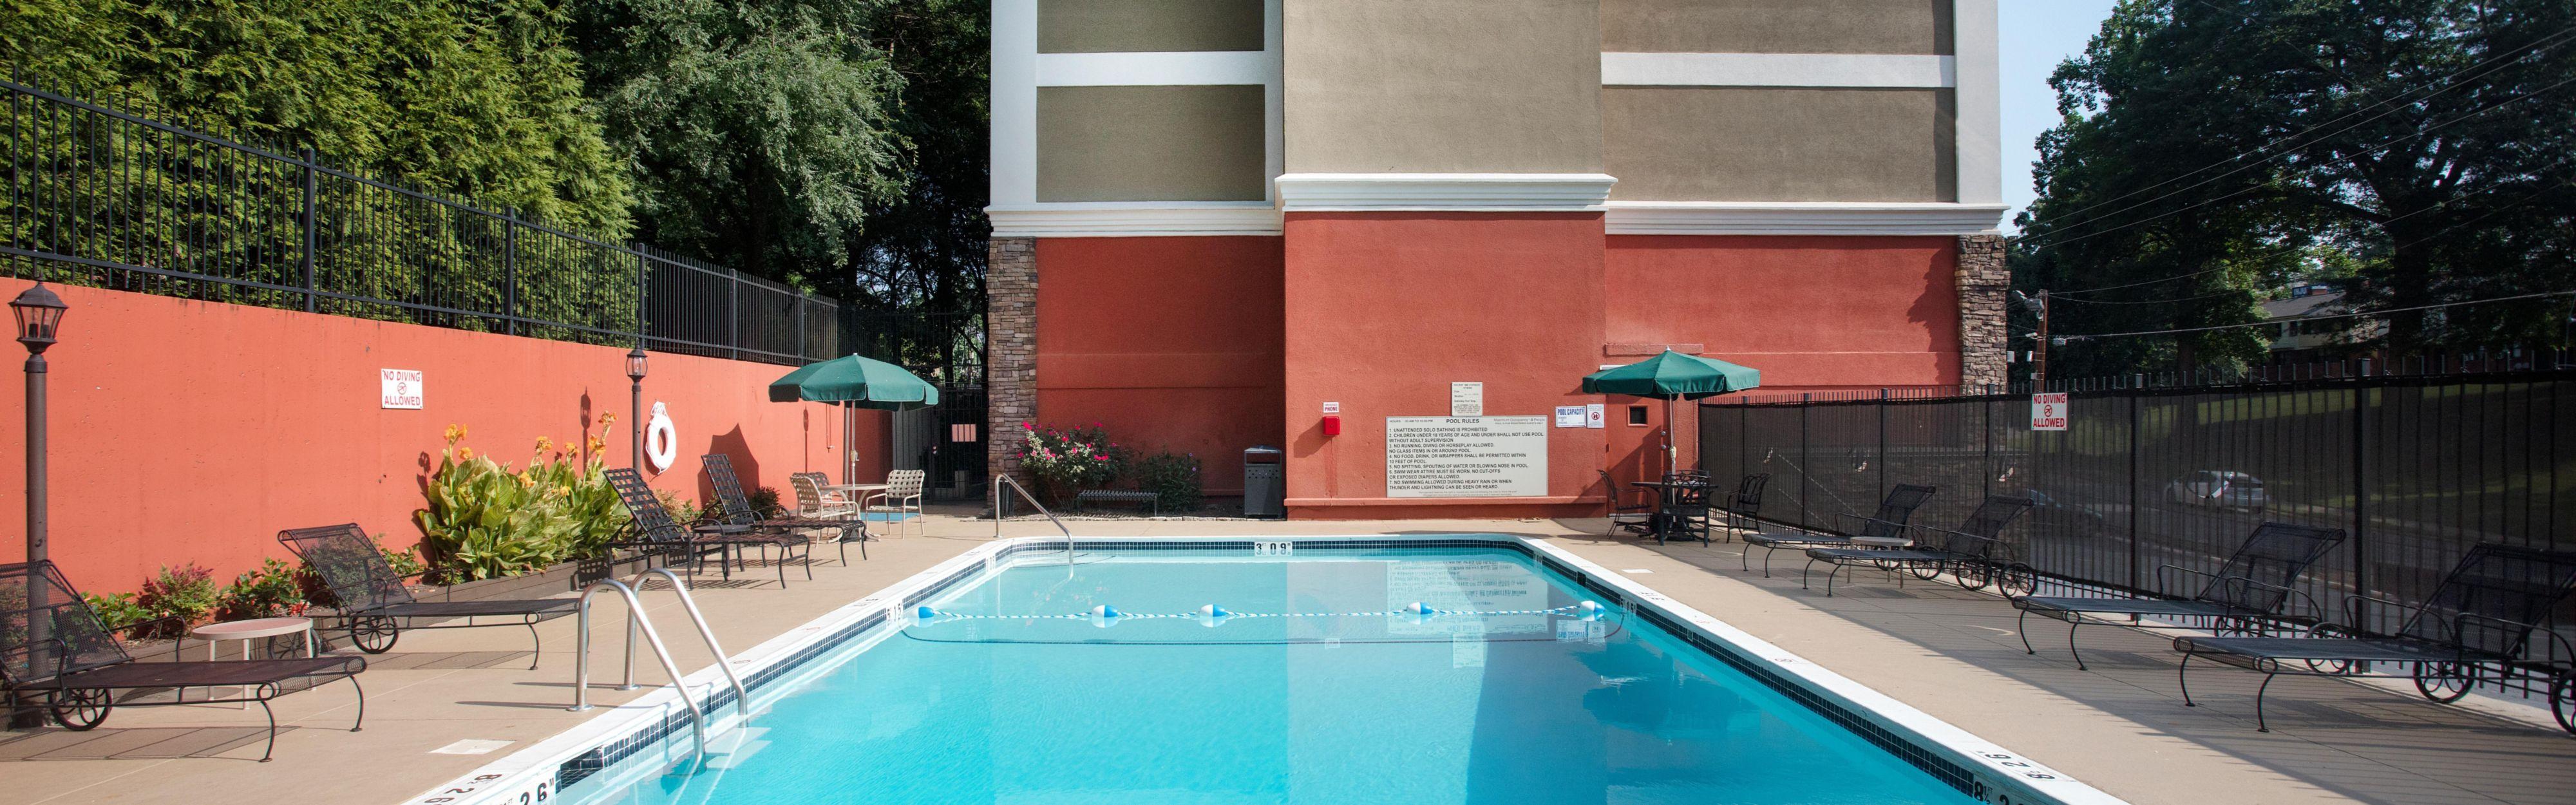 Holiday Inn Express Athens-University Area image 2